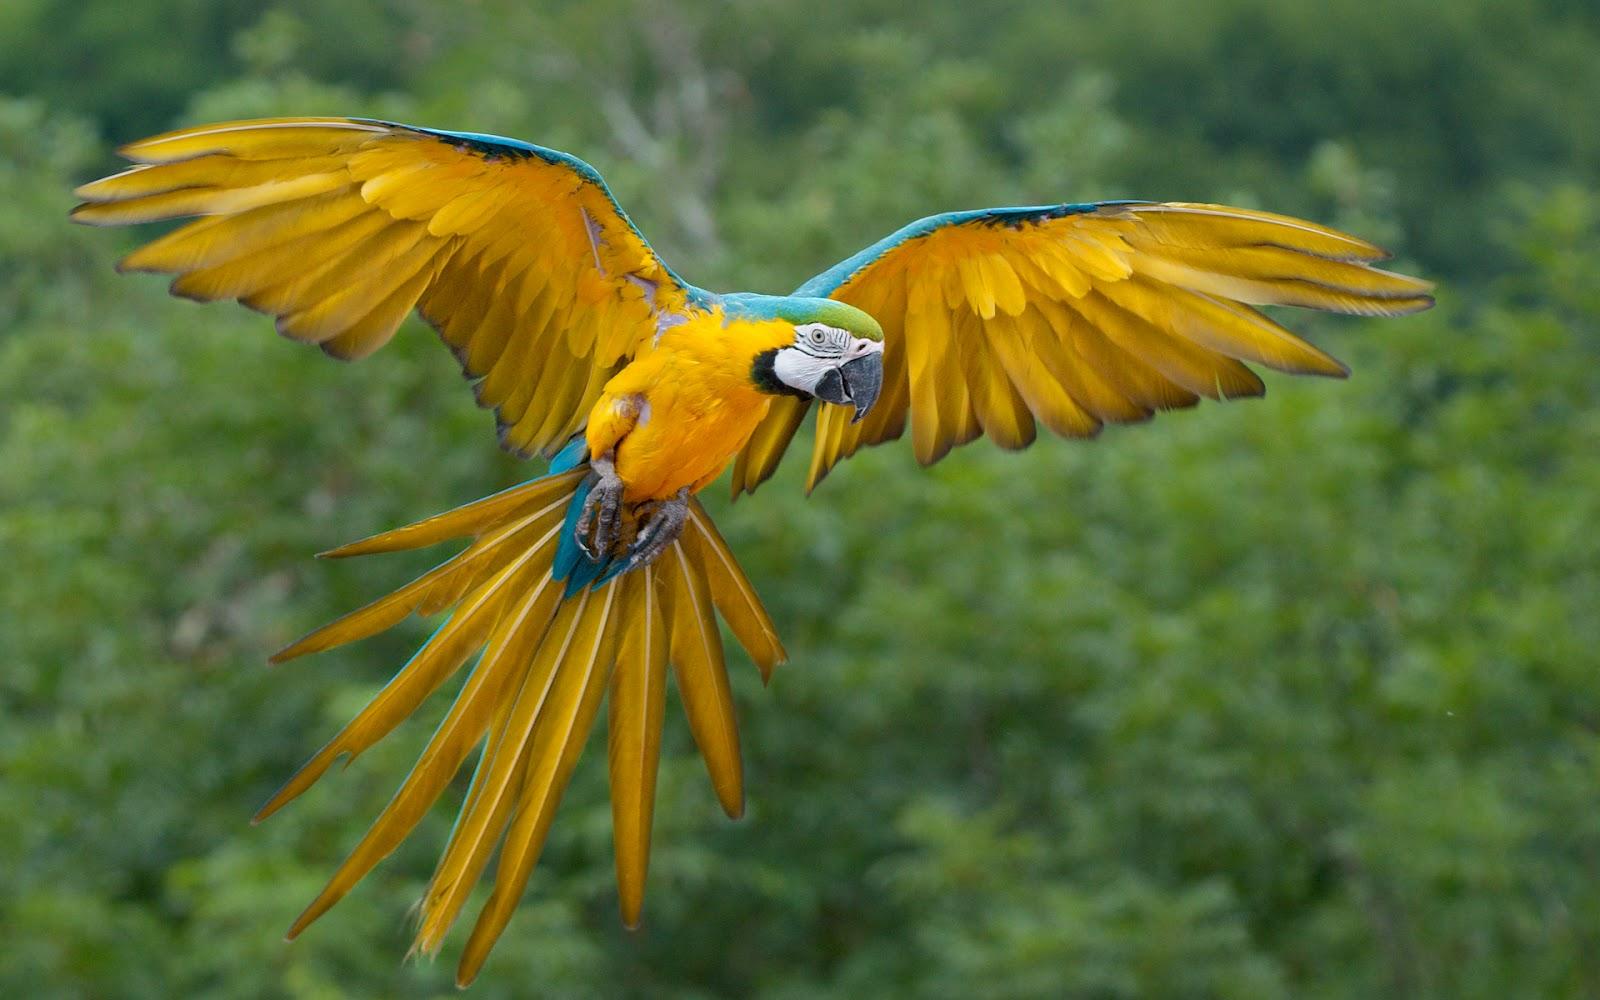 aves-exoticas_01.jpg